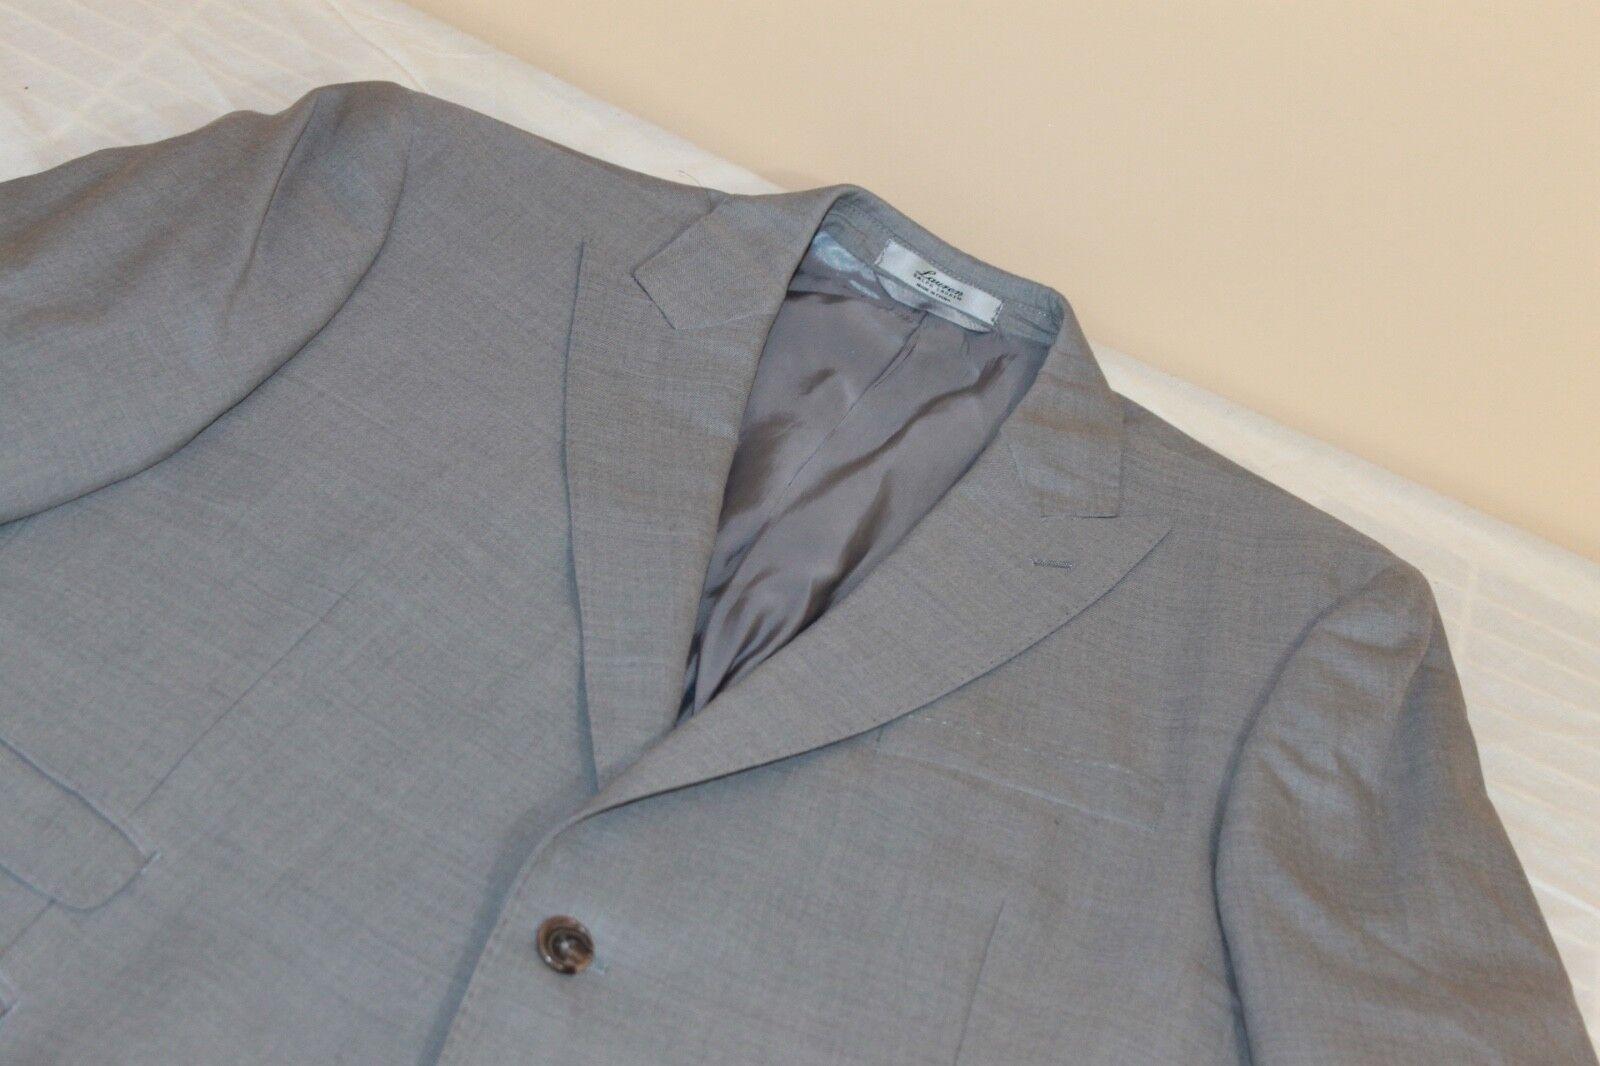 RALPH LAUREN Peaked Lapel Weiß Label grau Blazer 44 R 100% Wool